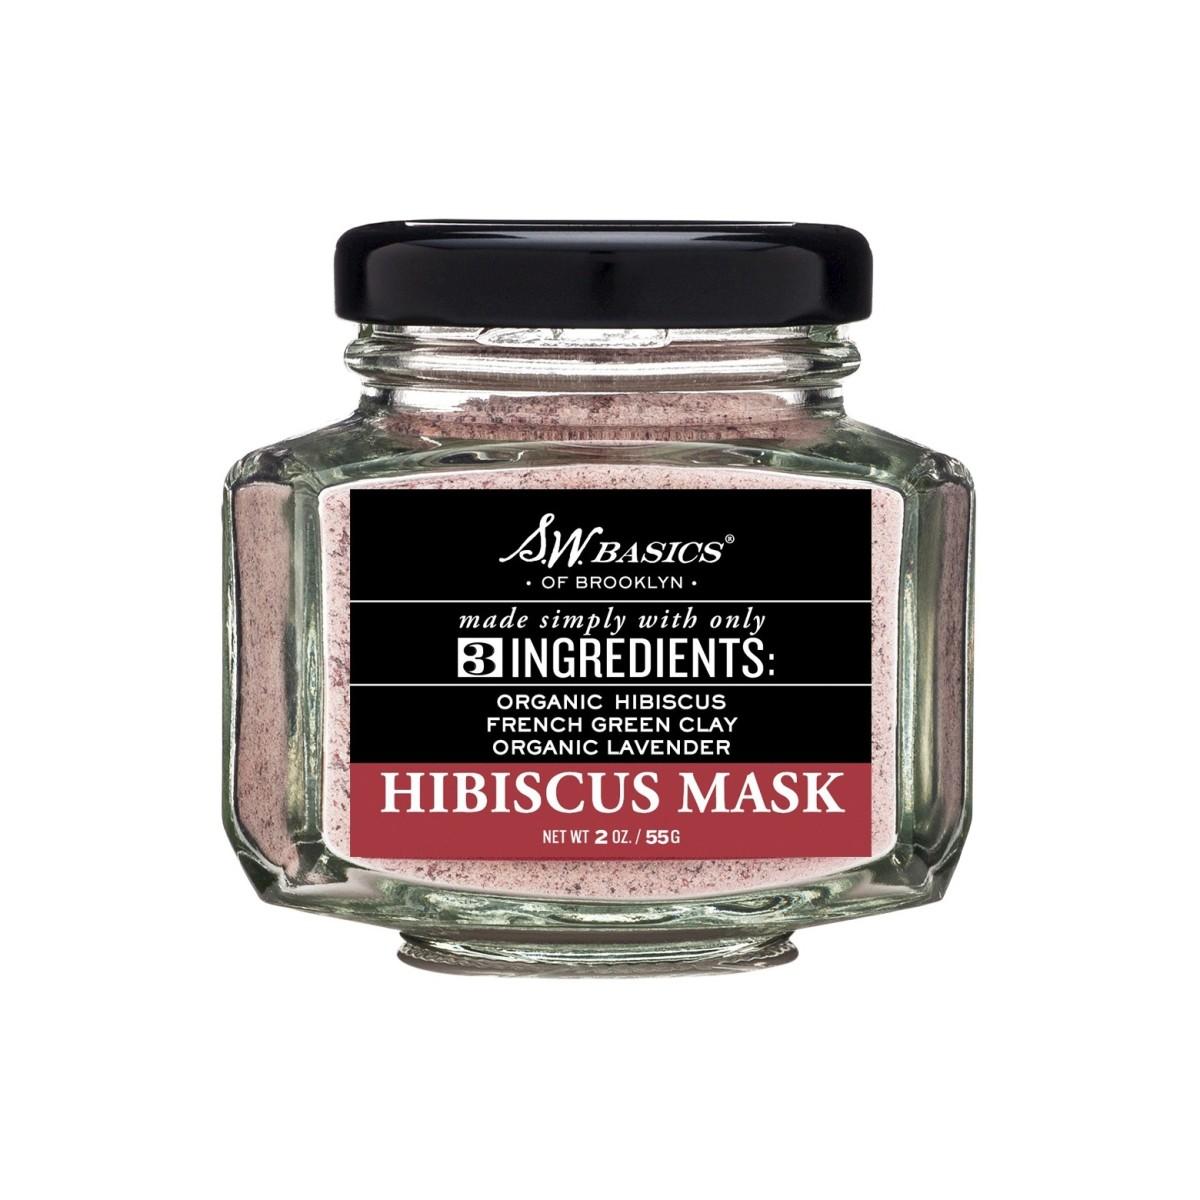 SW Basics® Hibiscus Mask